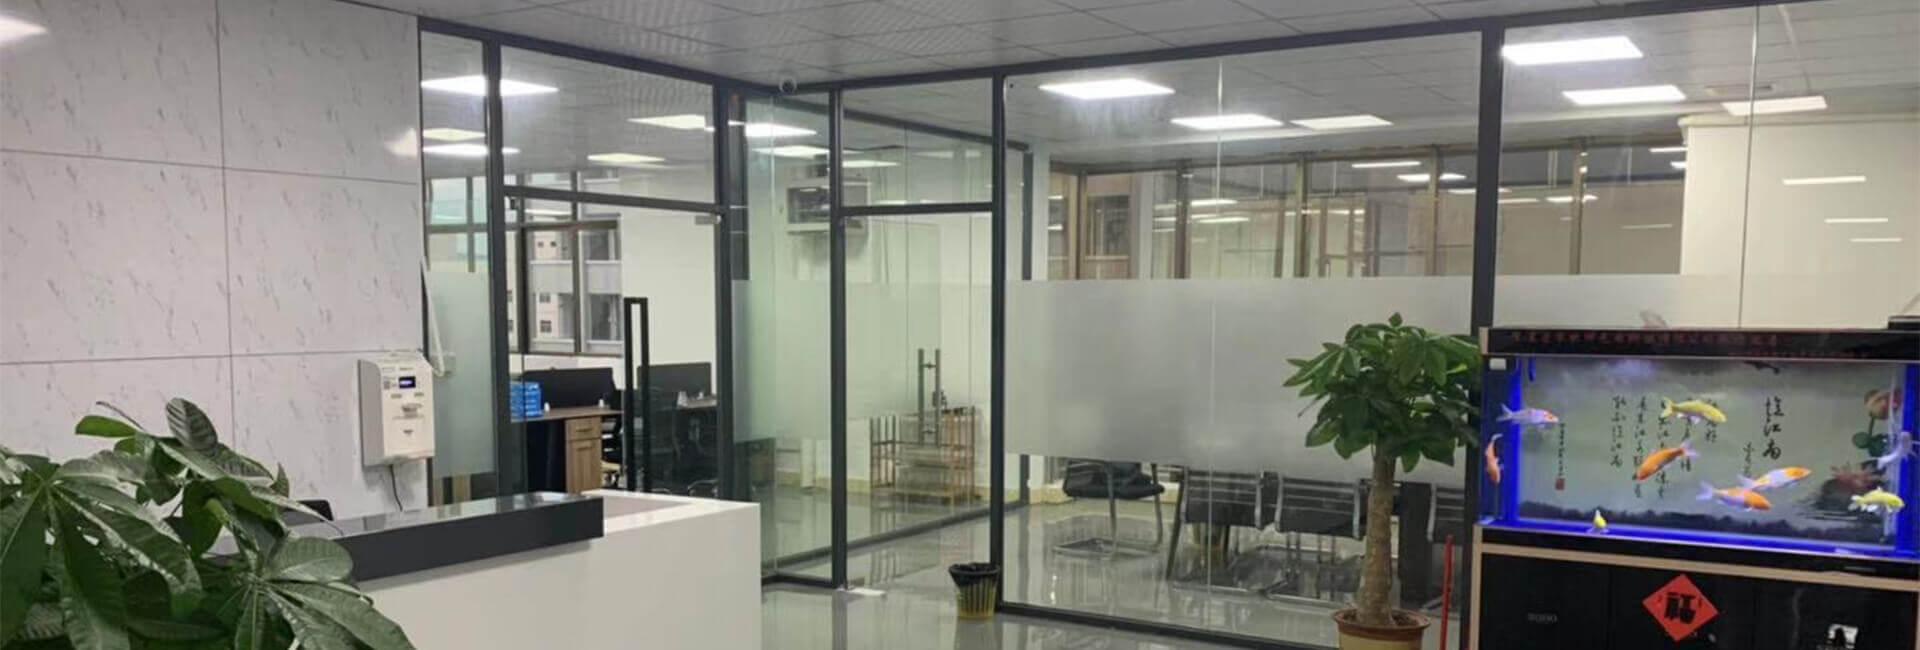 screen protector manufacturer